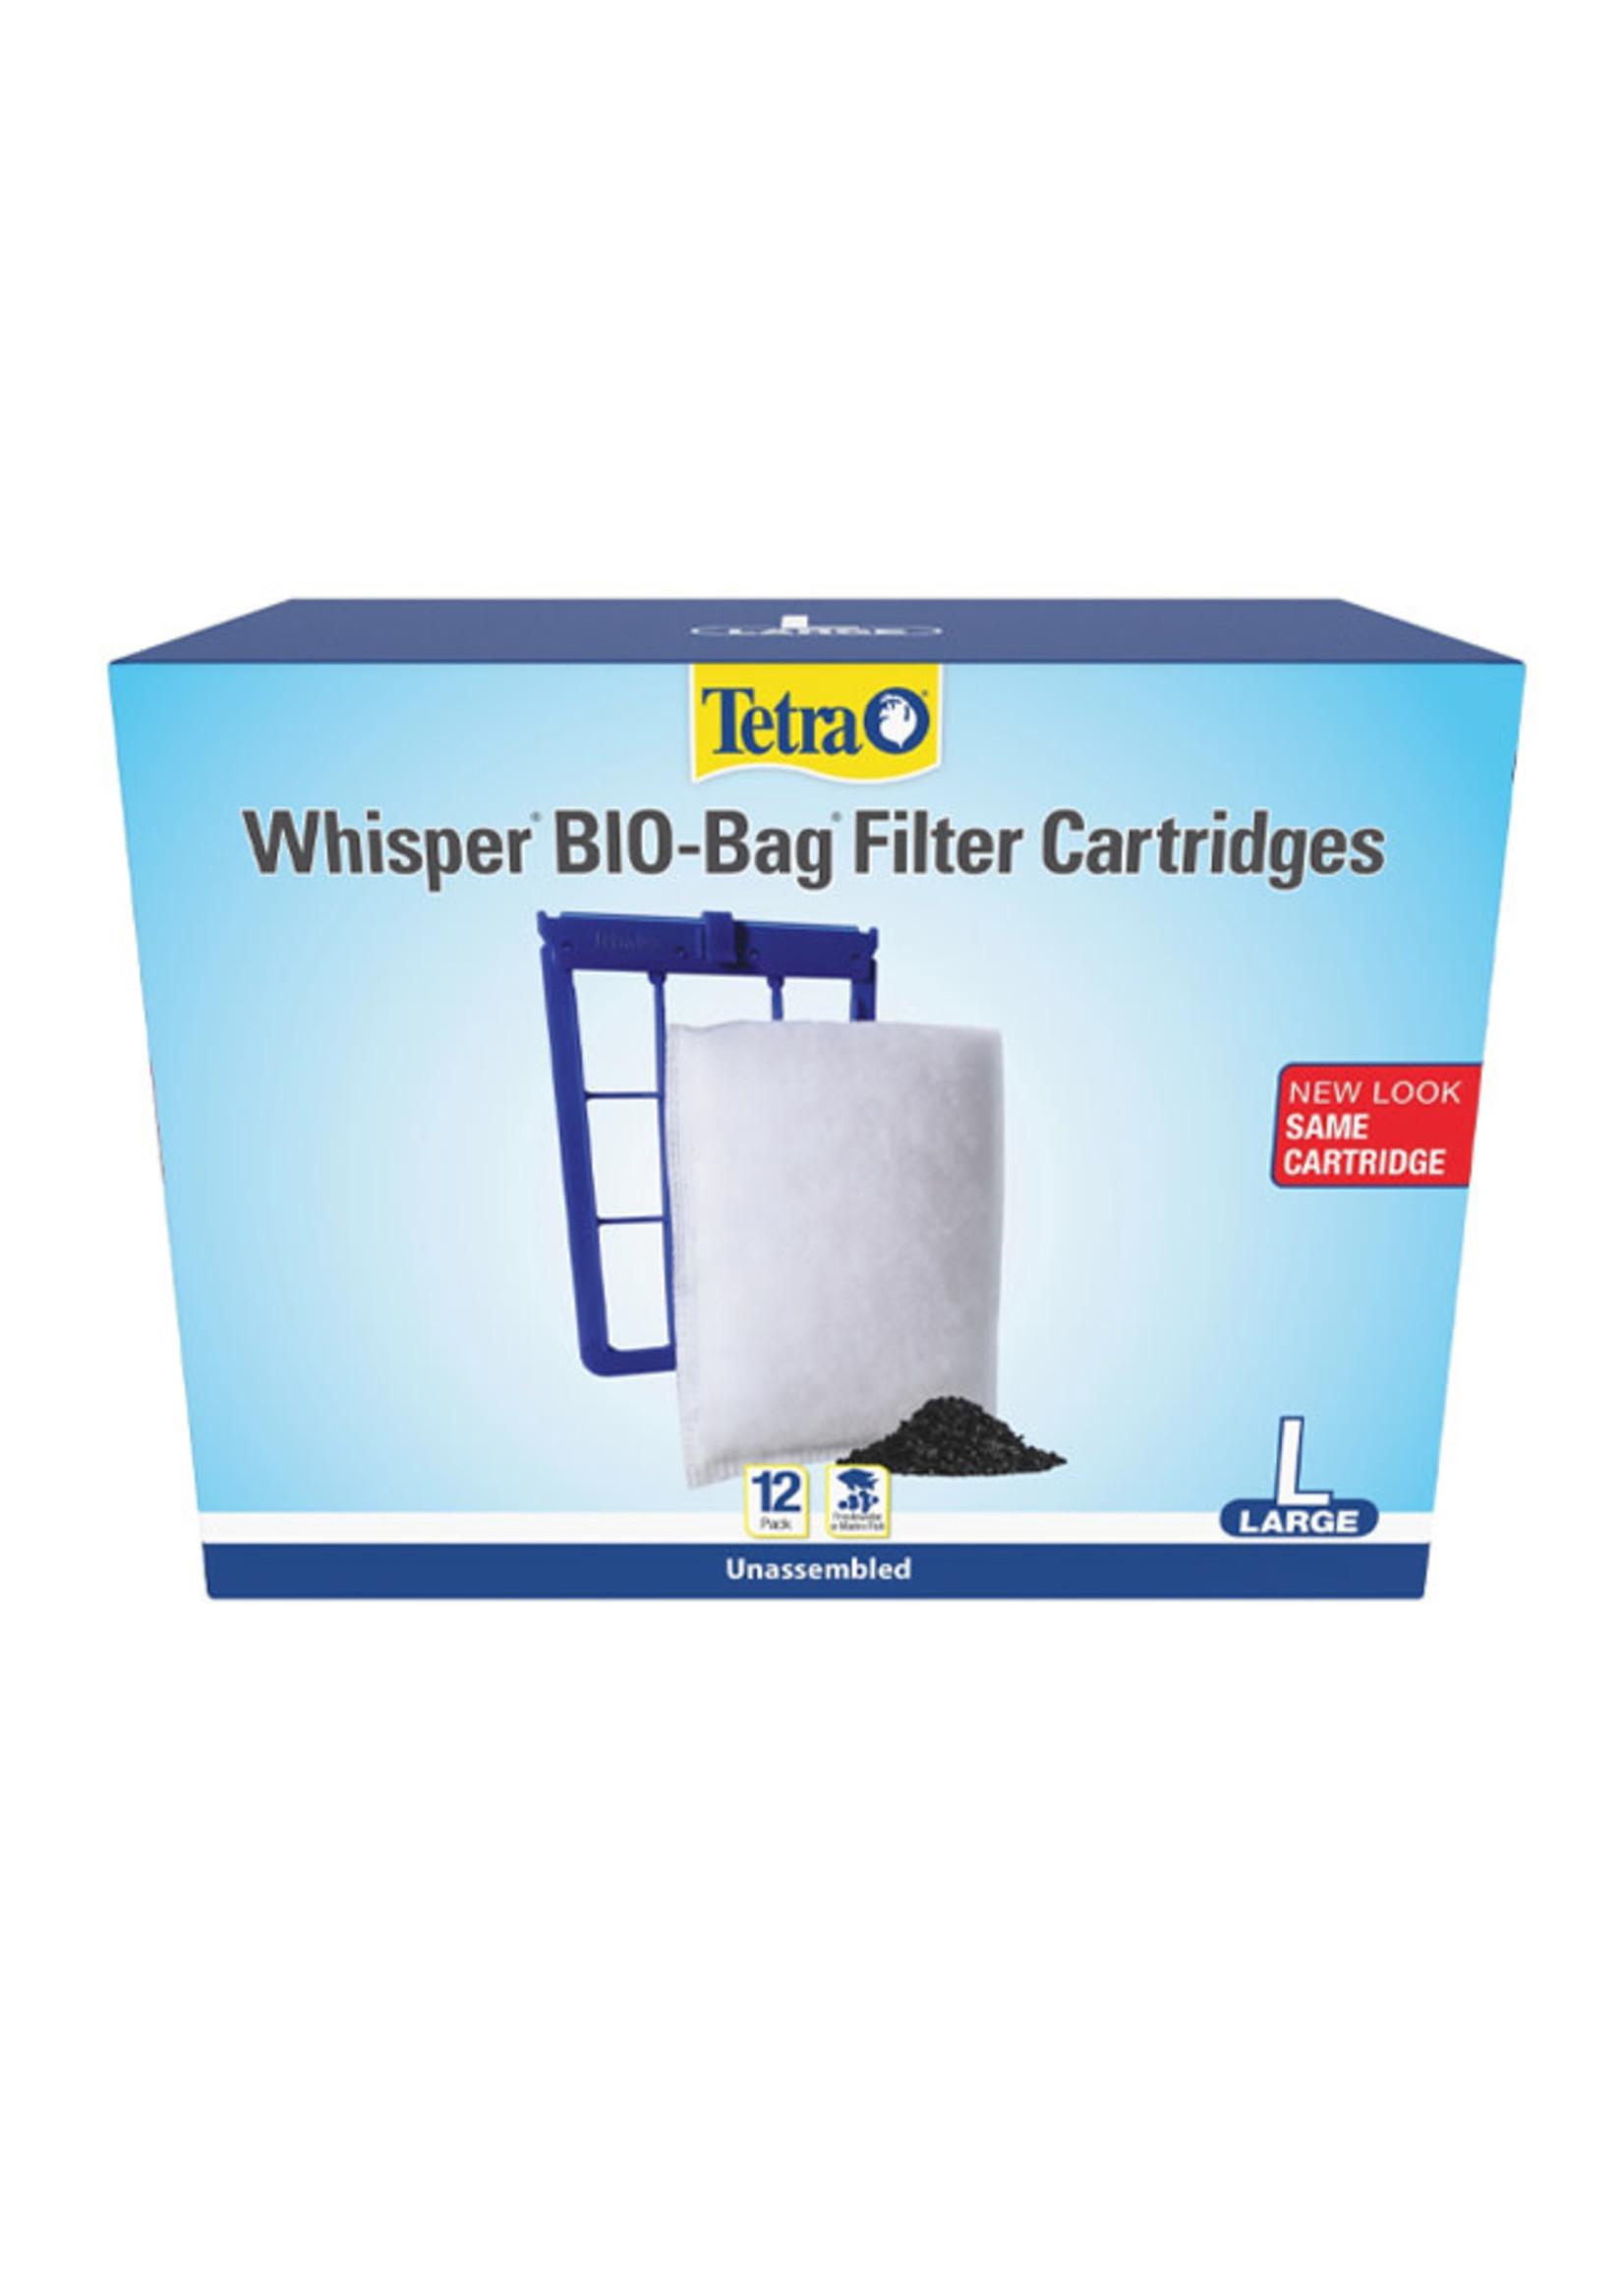 SPECTRUM BRANDS - TETRA Tetra Whisper BIO-Bag Filter Cartridges Unassembled